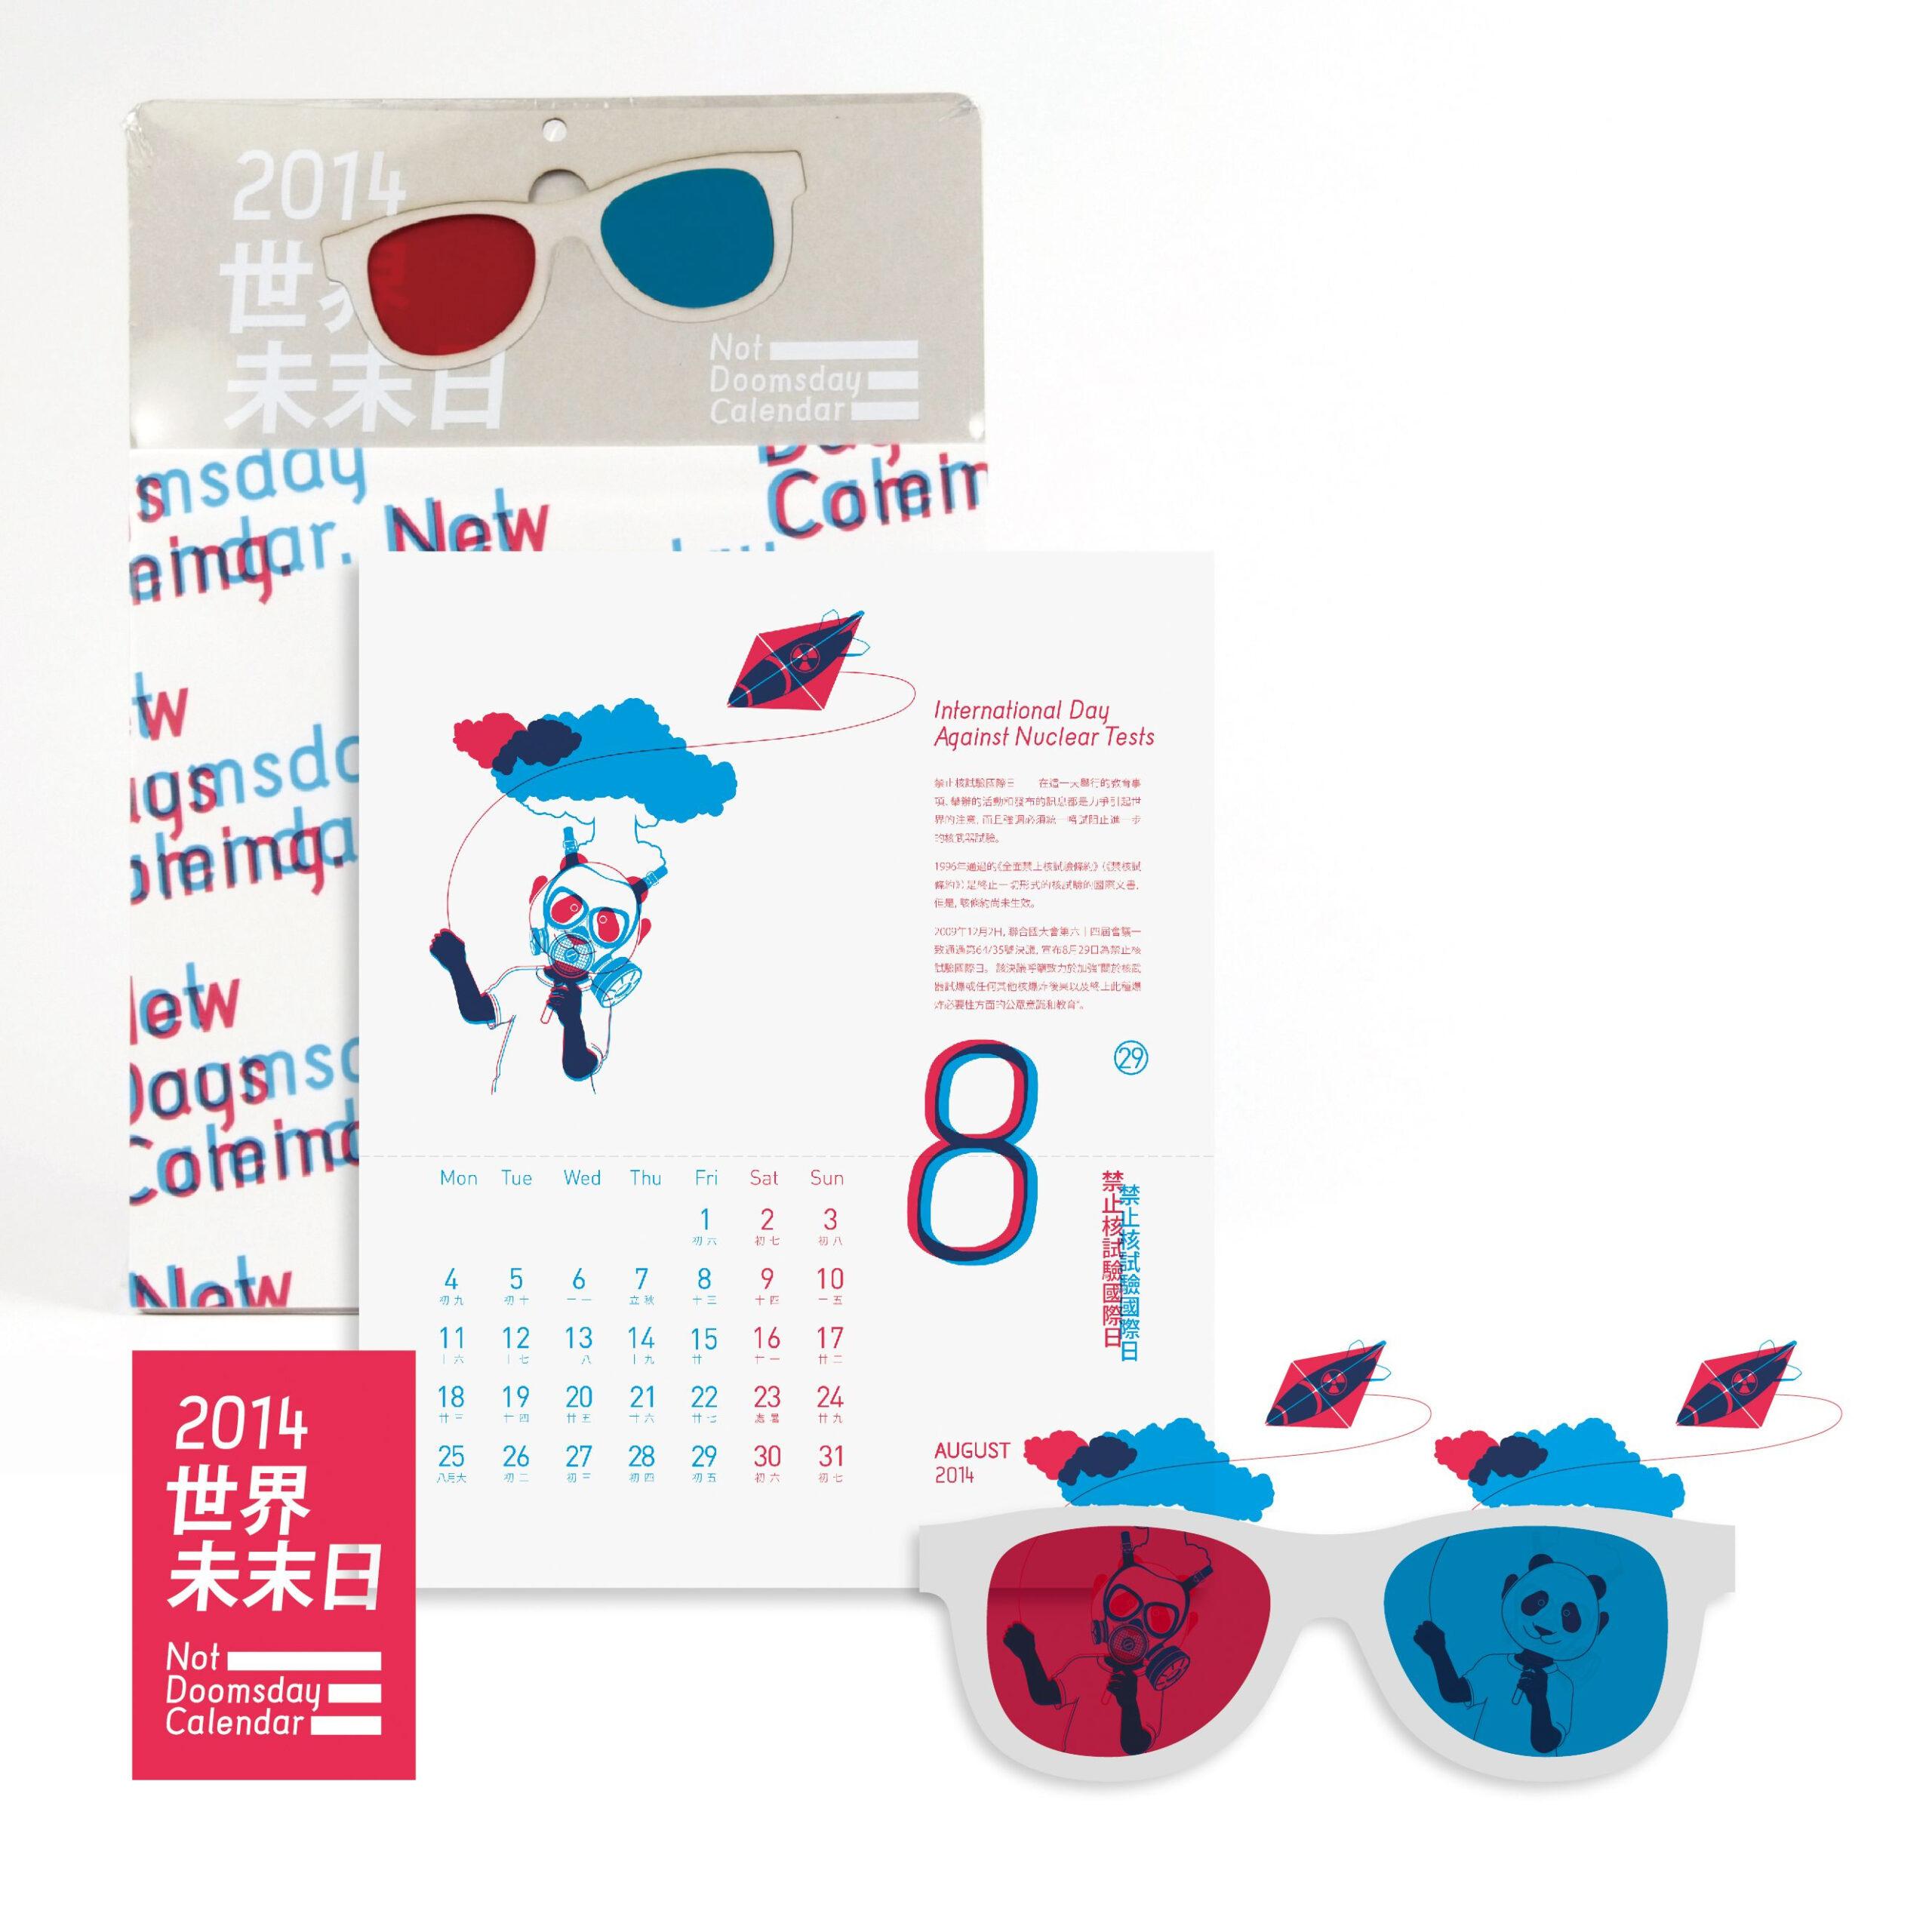 Not Doomsday Calendar 1   Calendar, Typography, Graphic Design